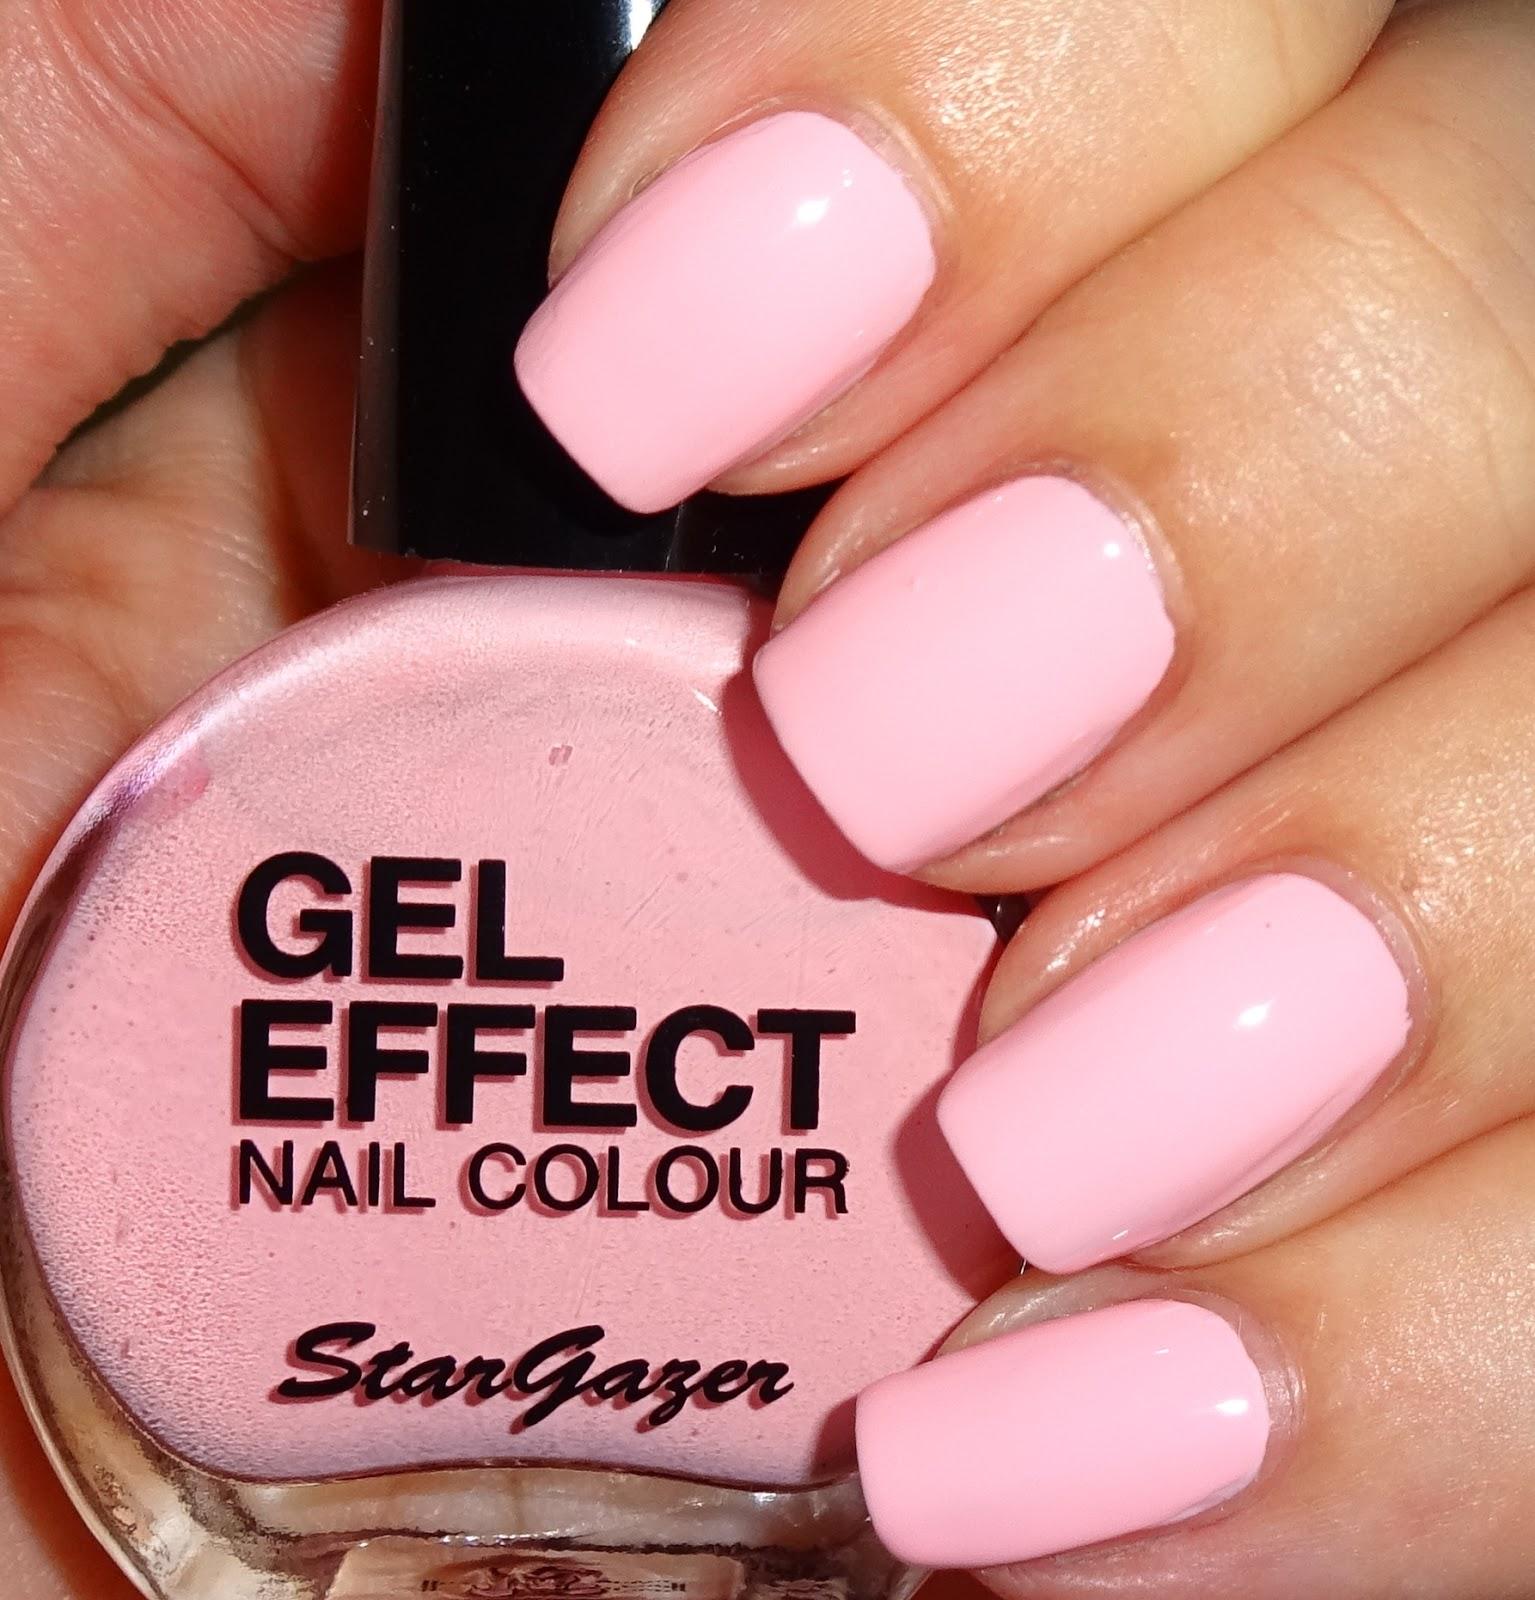 Wendy\'s Delights: Stargazer Gel Effect Nail Polish - Baby